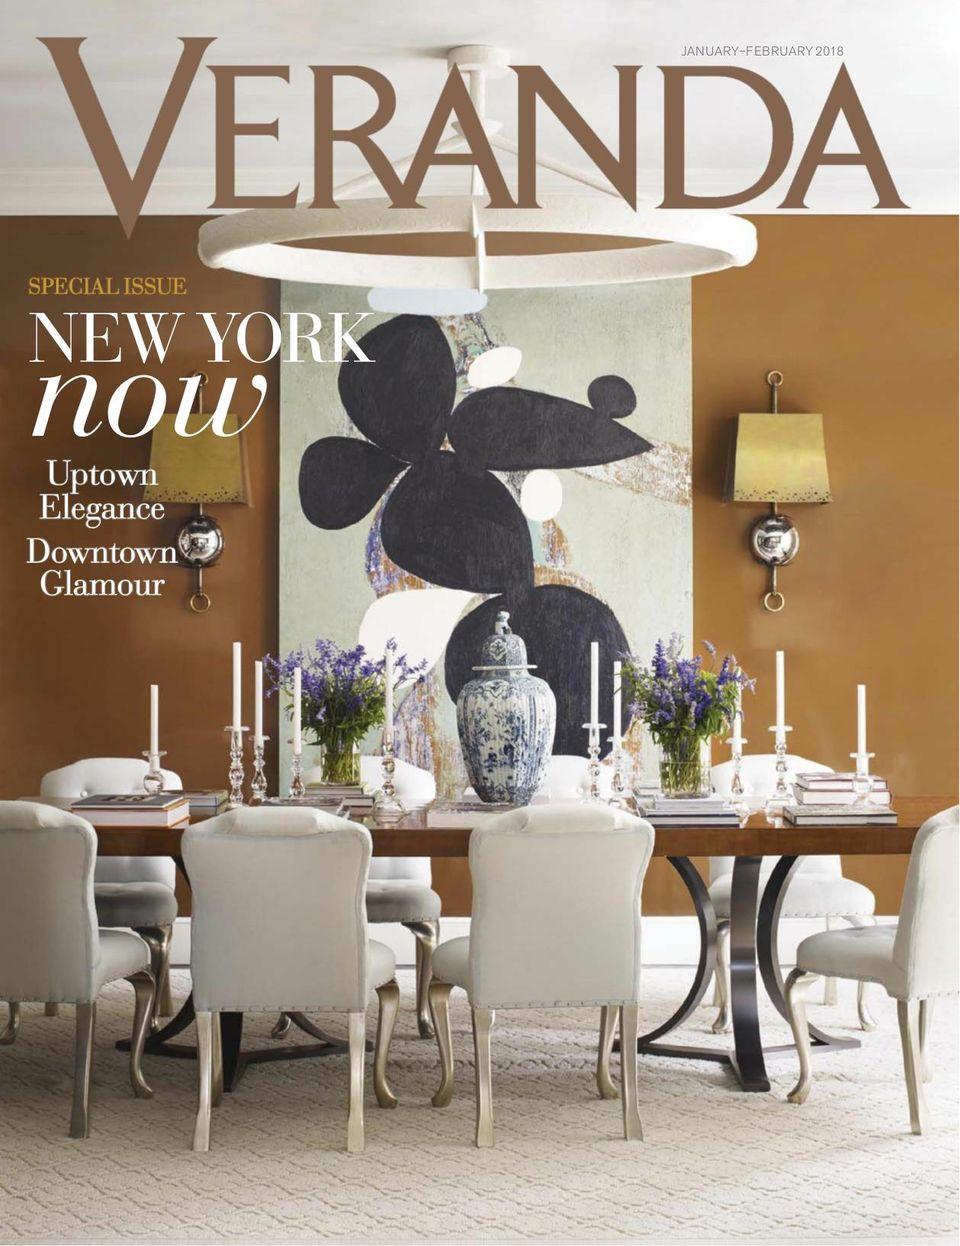 Veranda-January/February 2018 Magazine - Get your Digital Subscription